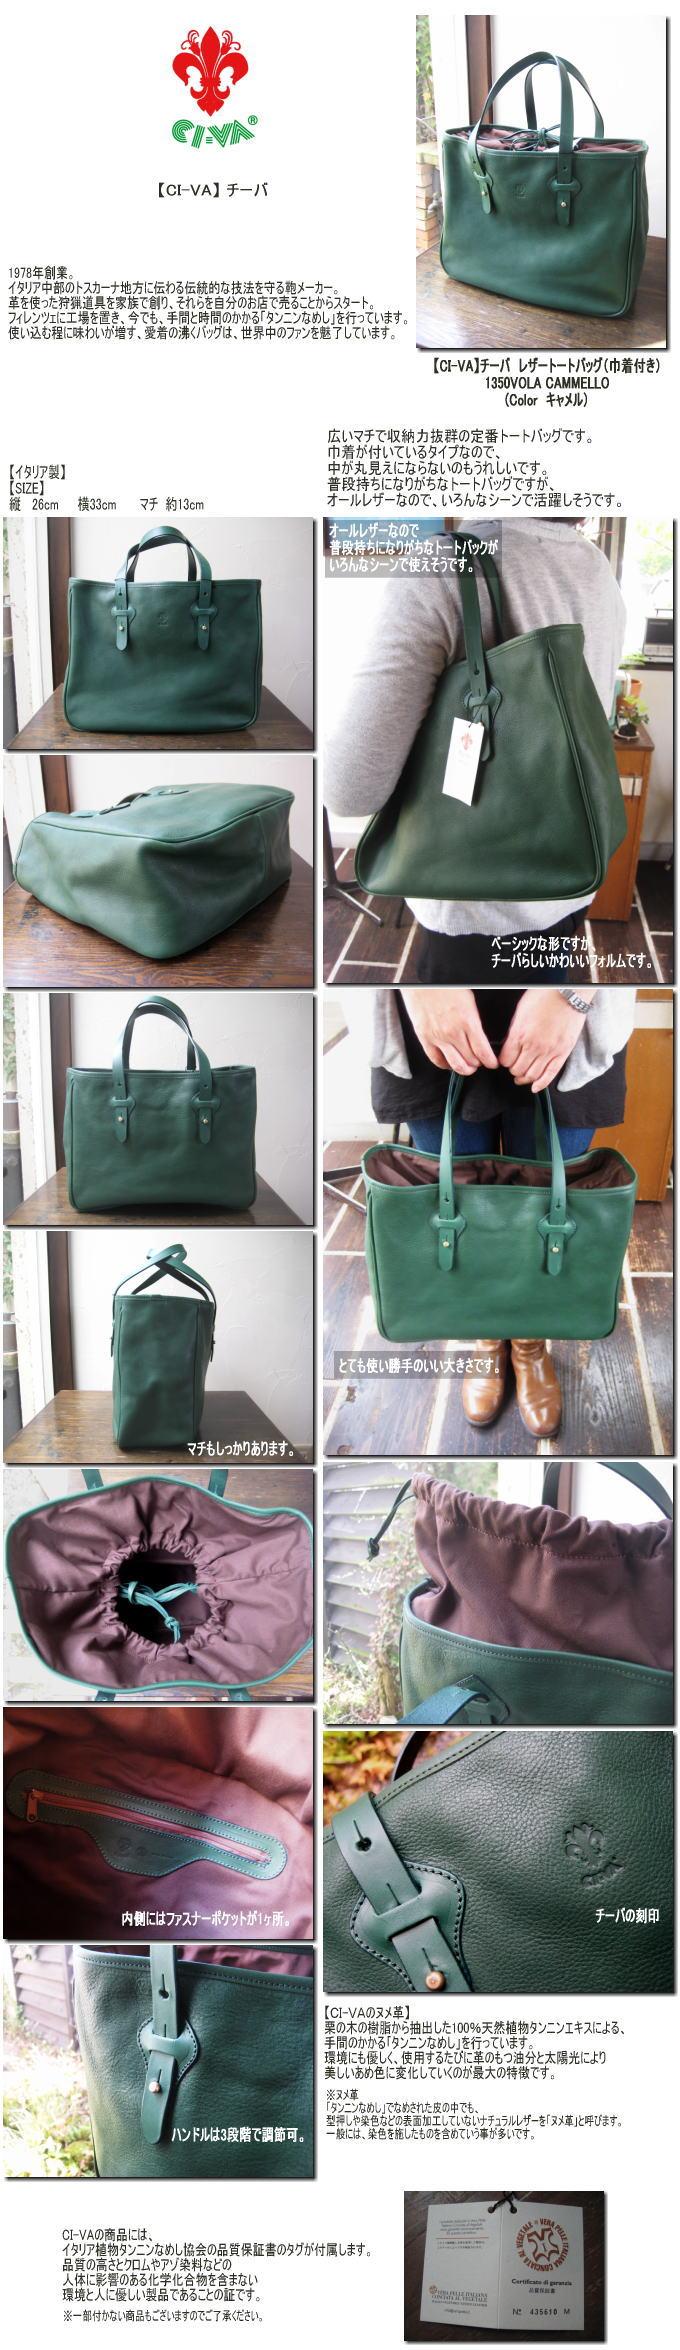 【CI-VA】チーバ レザートートバッグ(巾着付き) 1350VOLA VERDE (Color グリーン)